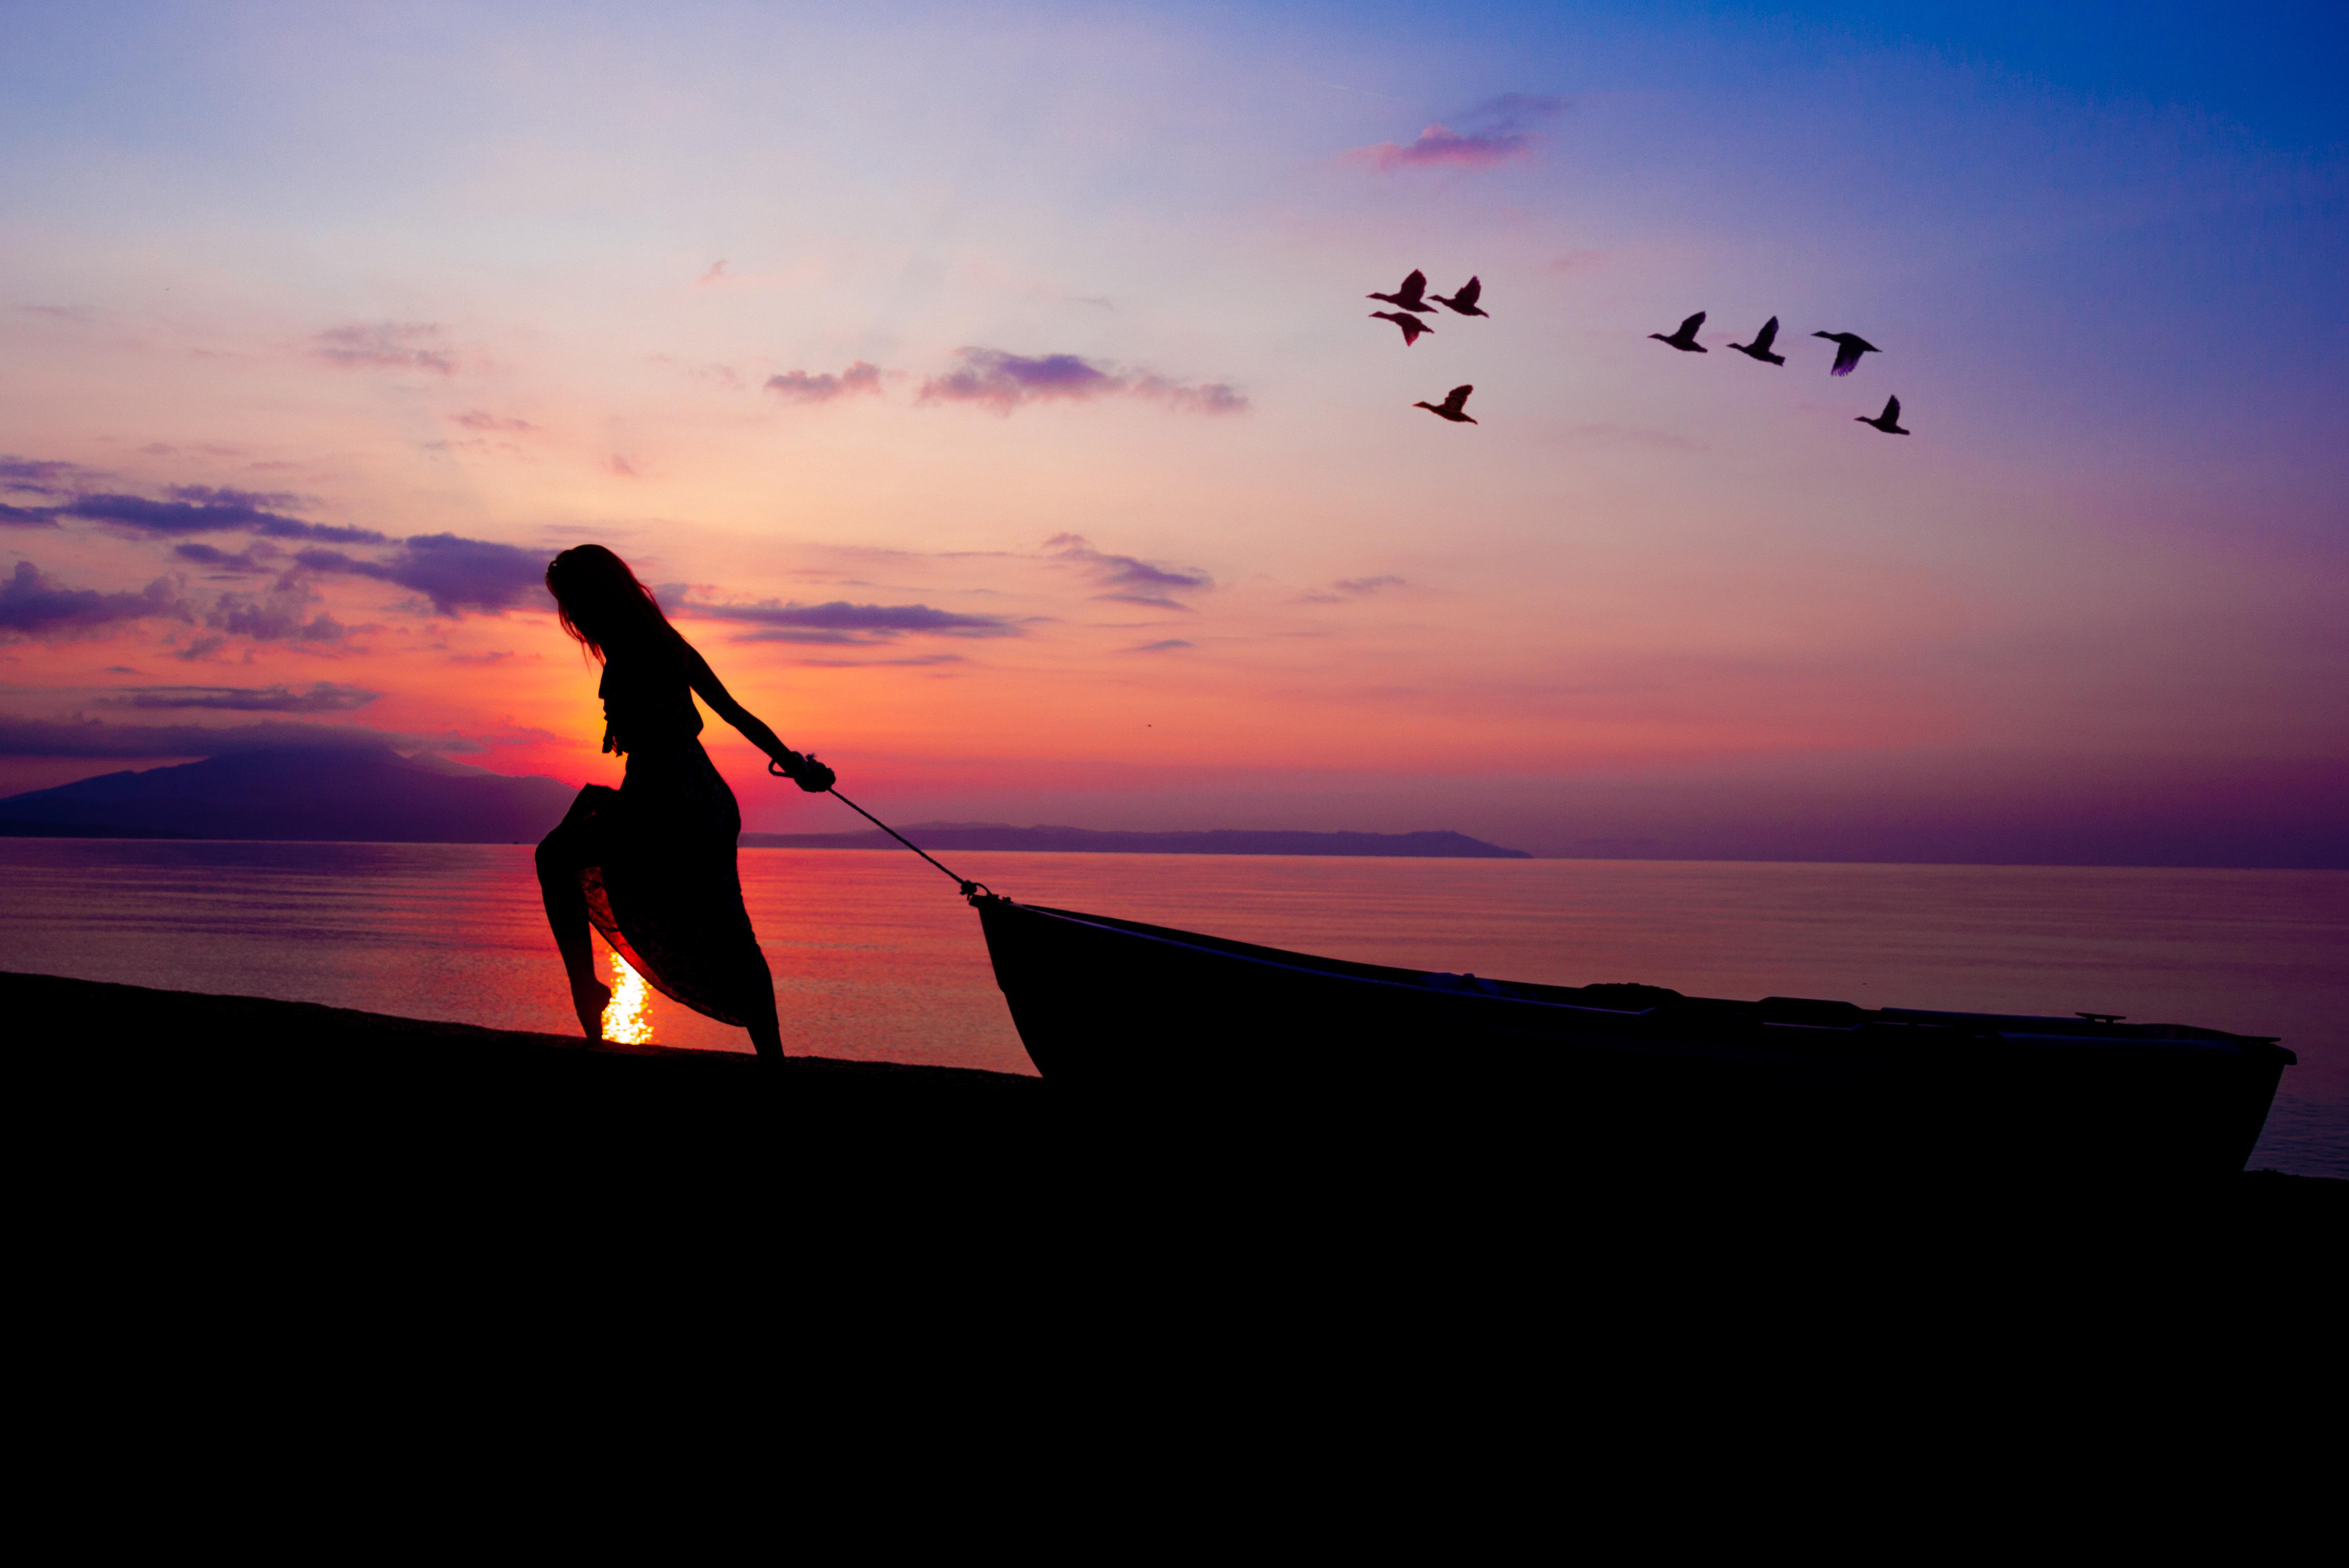 Wallpaper Fisherman Sunset Boat Hd Creative Graphics: Women Towing Boat Beach Sunset Silhouette, HD Nature, 4k